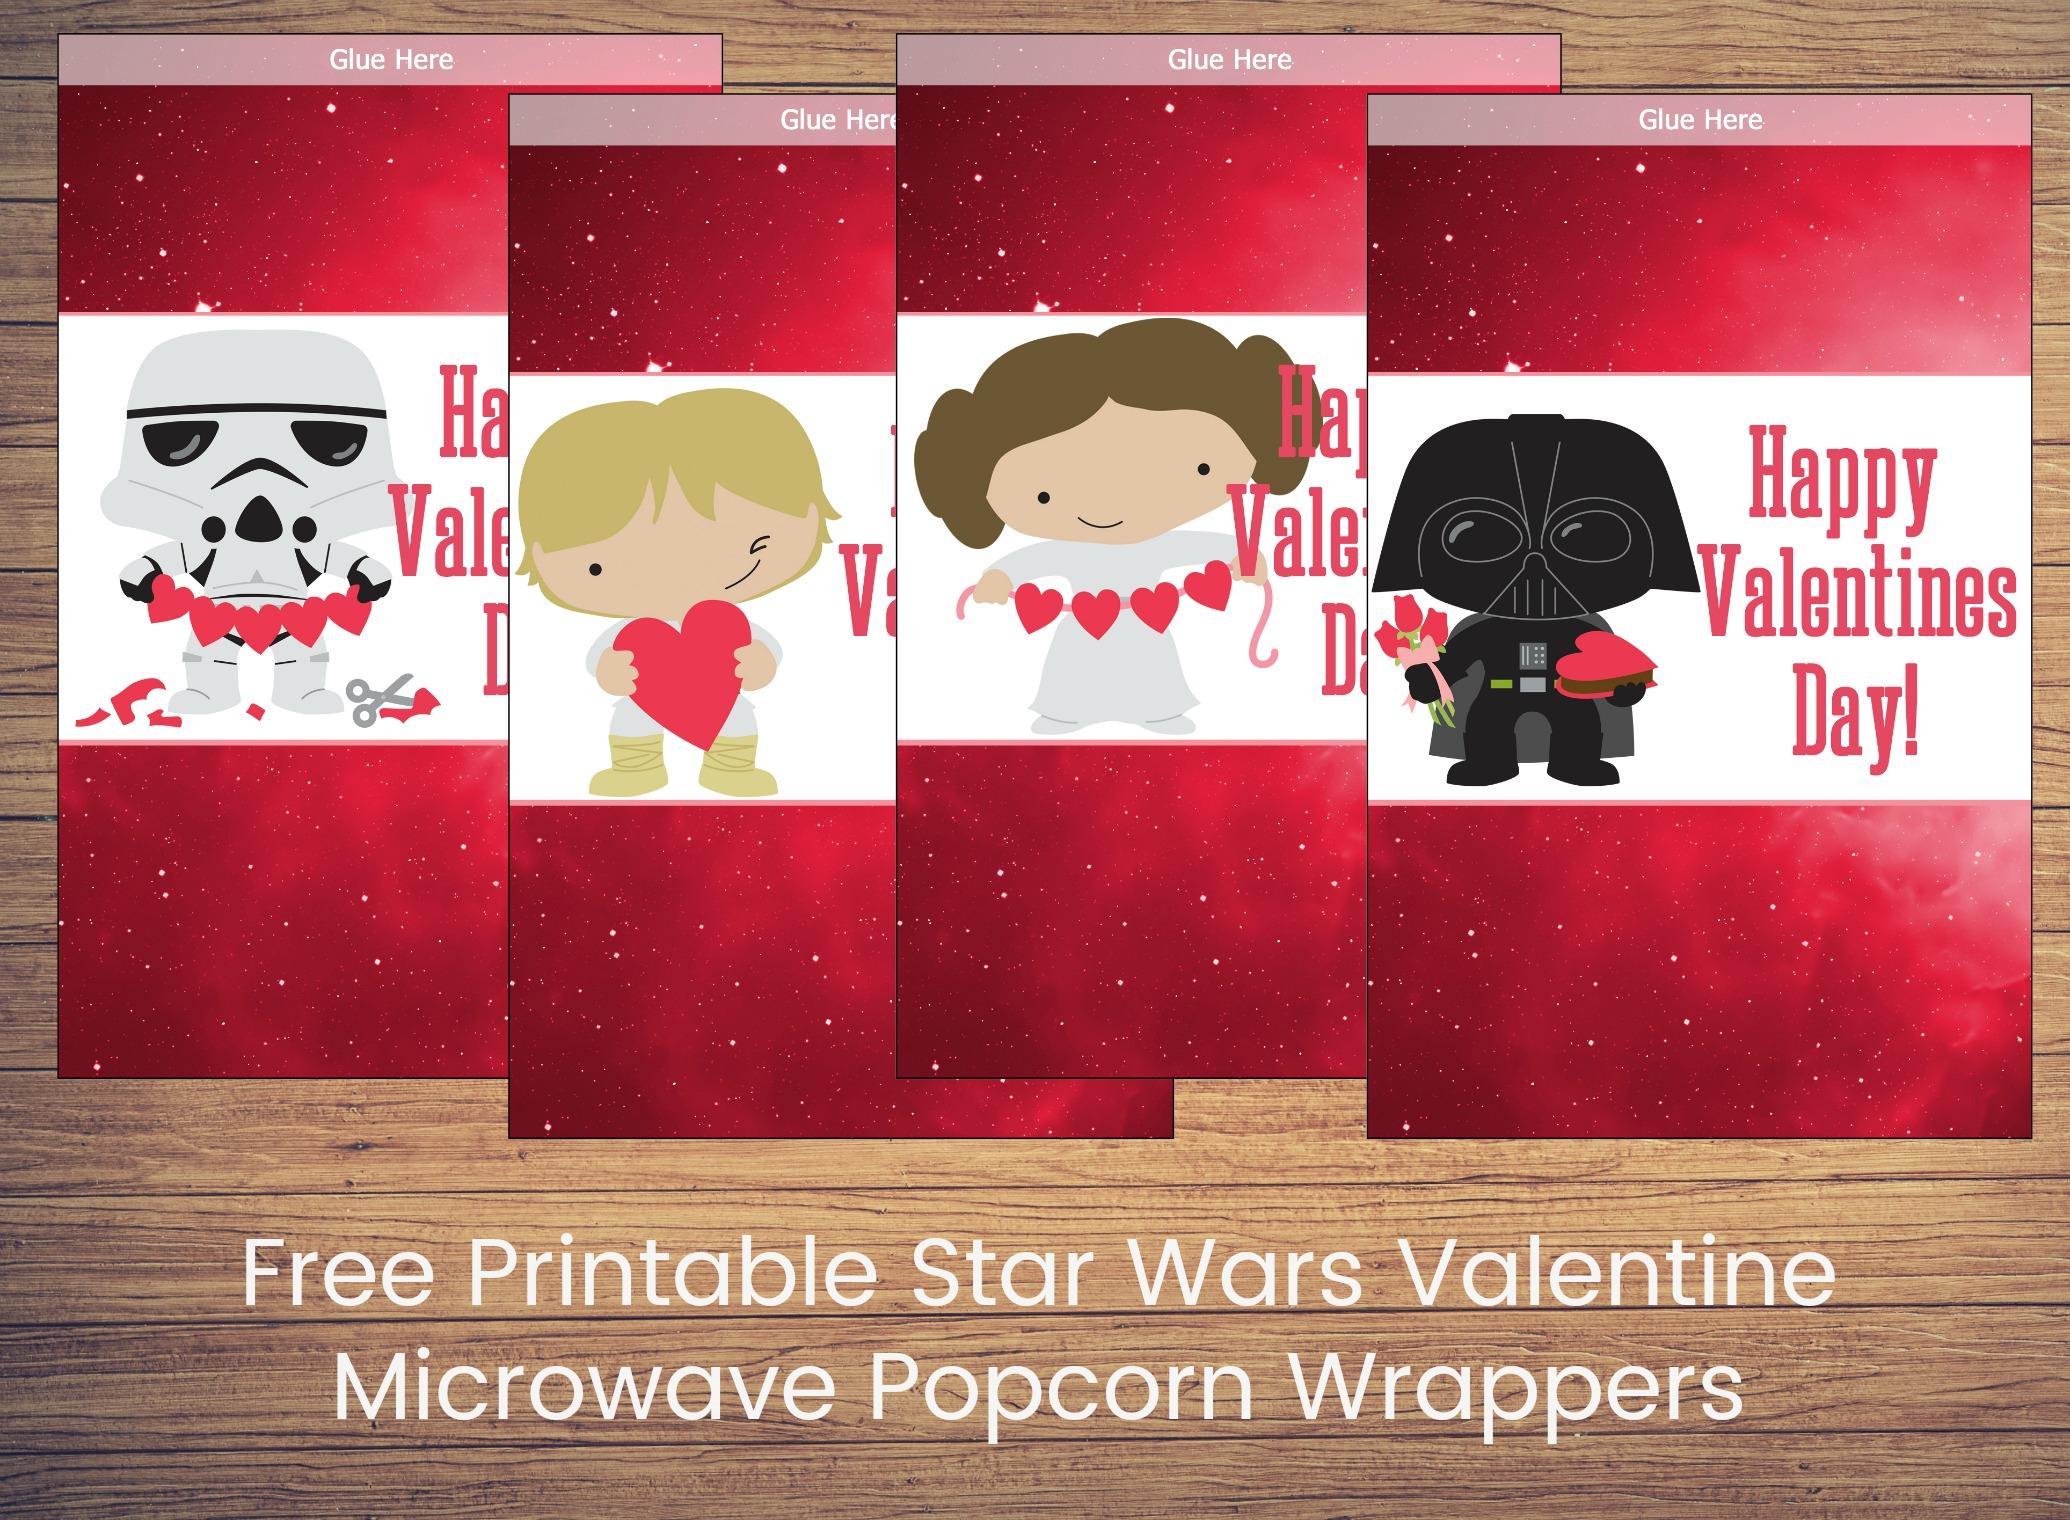 free printable star wars valentine microwave popcorn wrappers